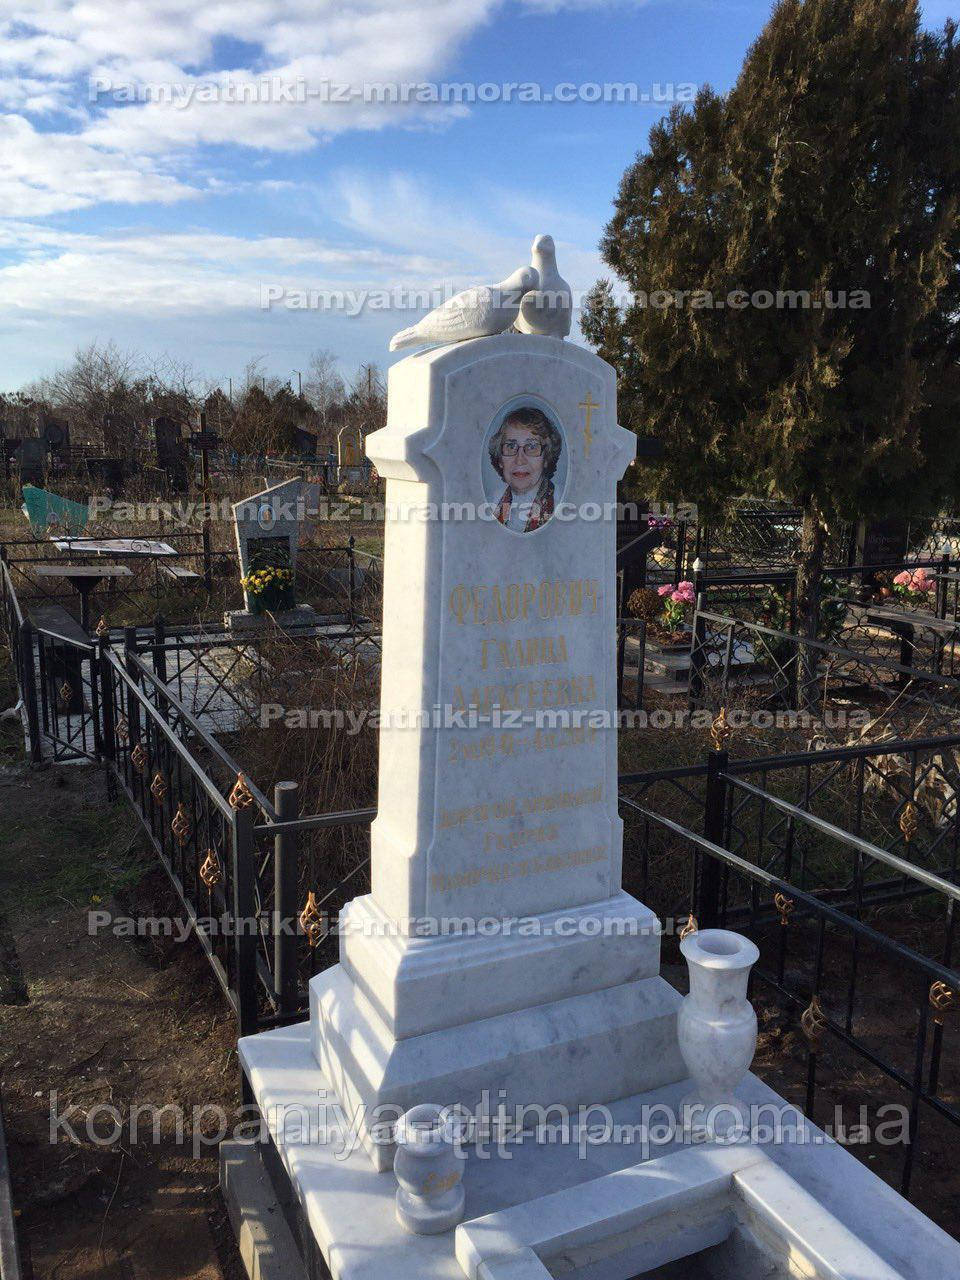 Памятник мраморный с Голубями №11